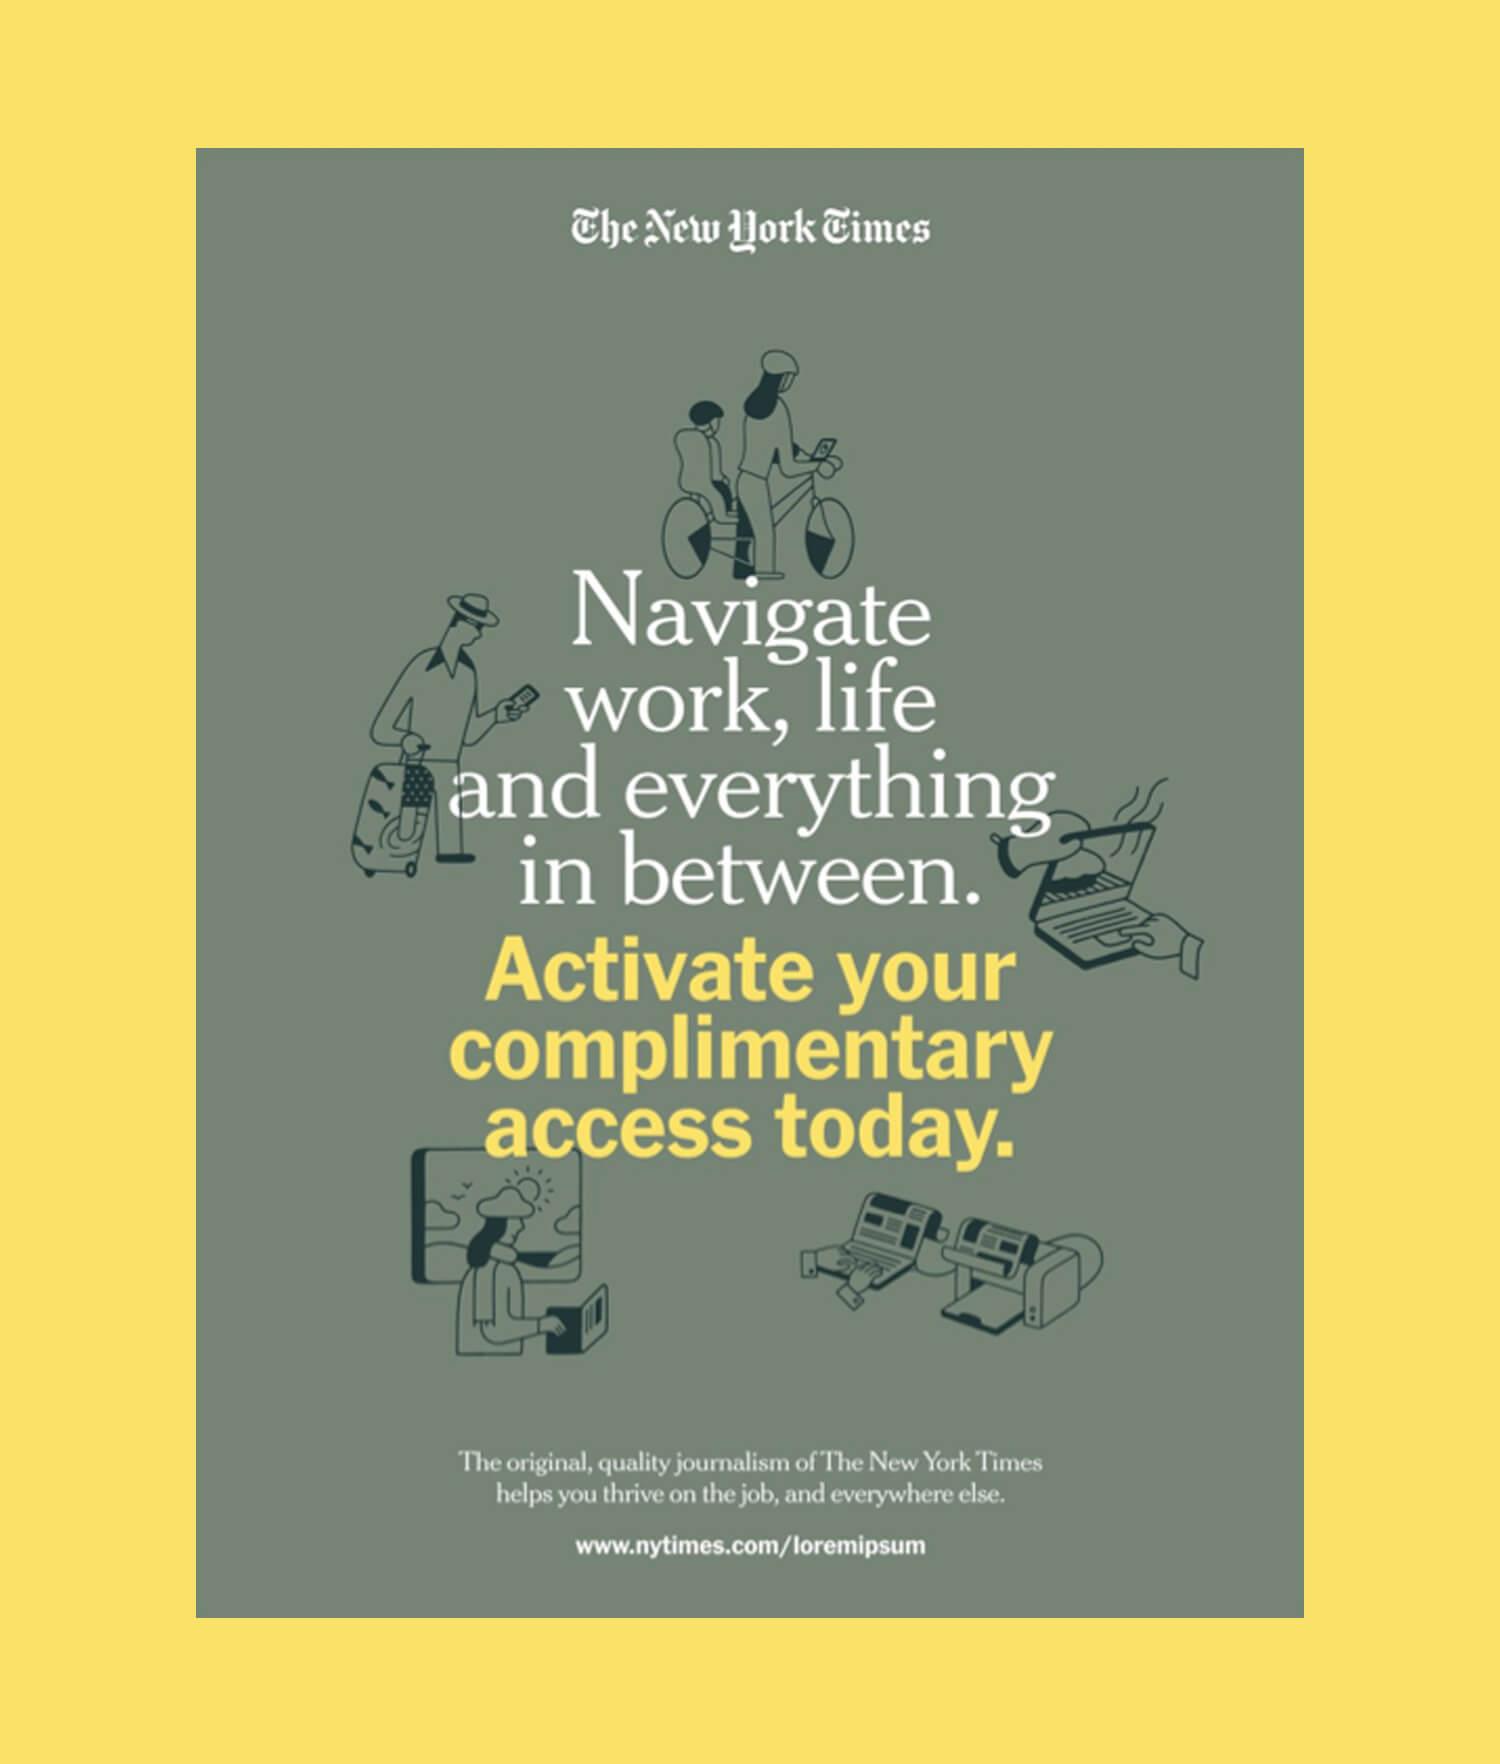 miguel-porlan-illustration-the-new-york-times-b2b-spots-12